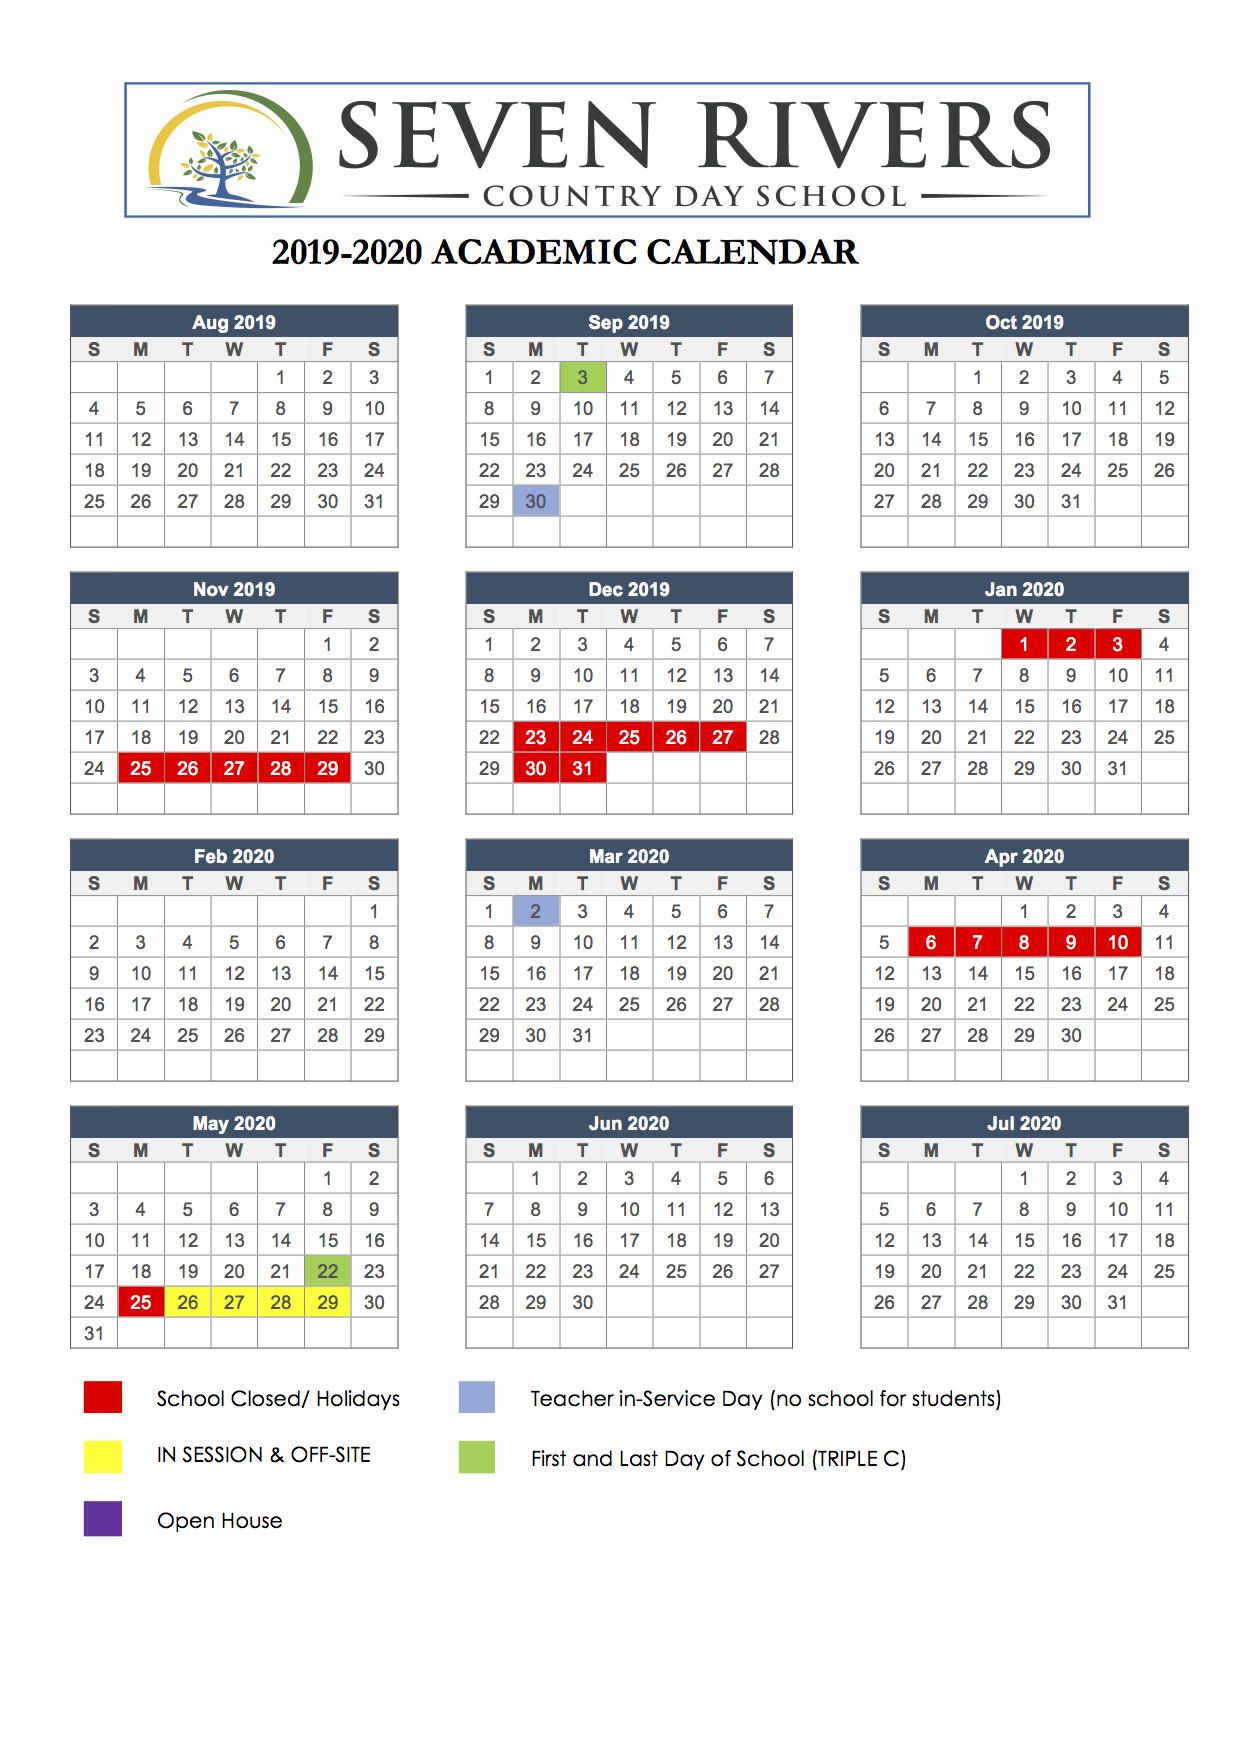 Seven Rivers Academic Calendar 2019-20.jpg